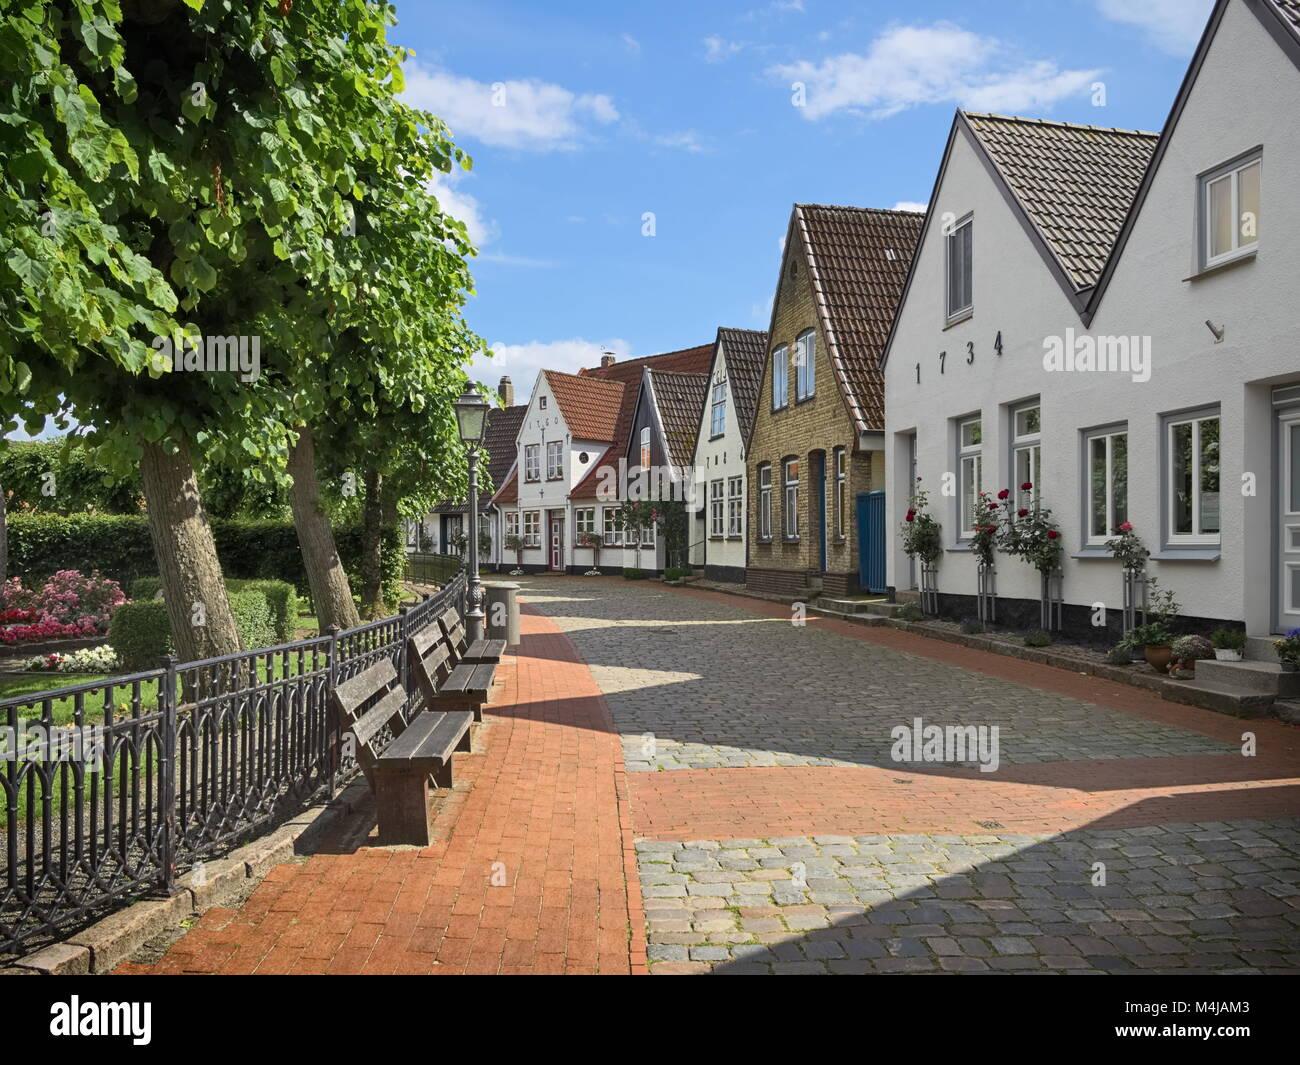 Schleswig - Fishing village Holm, Germany - Stock Image